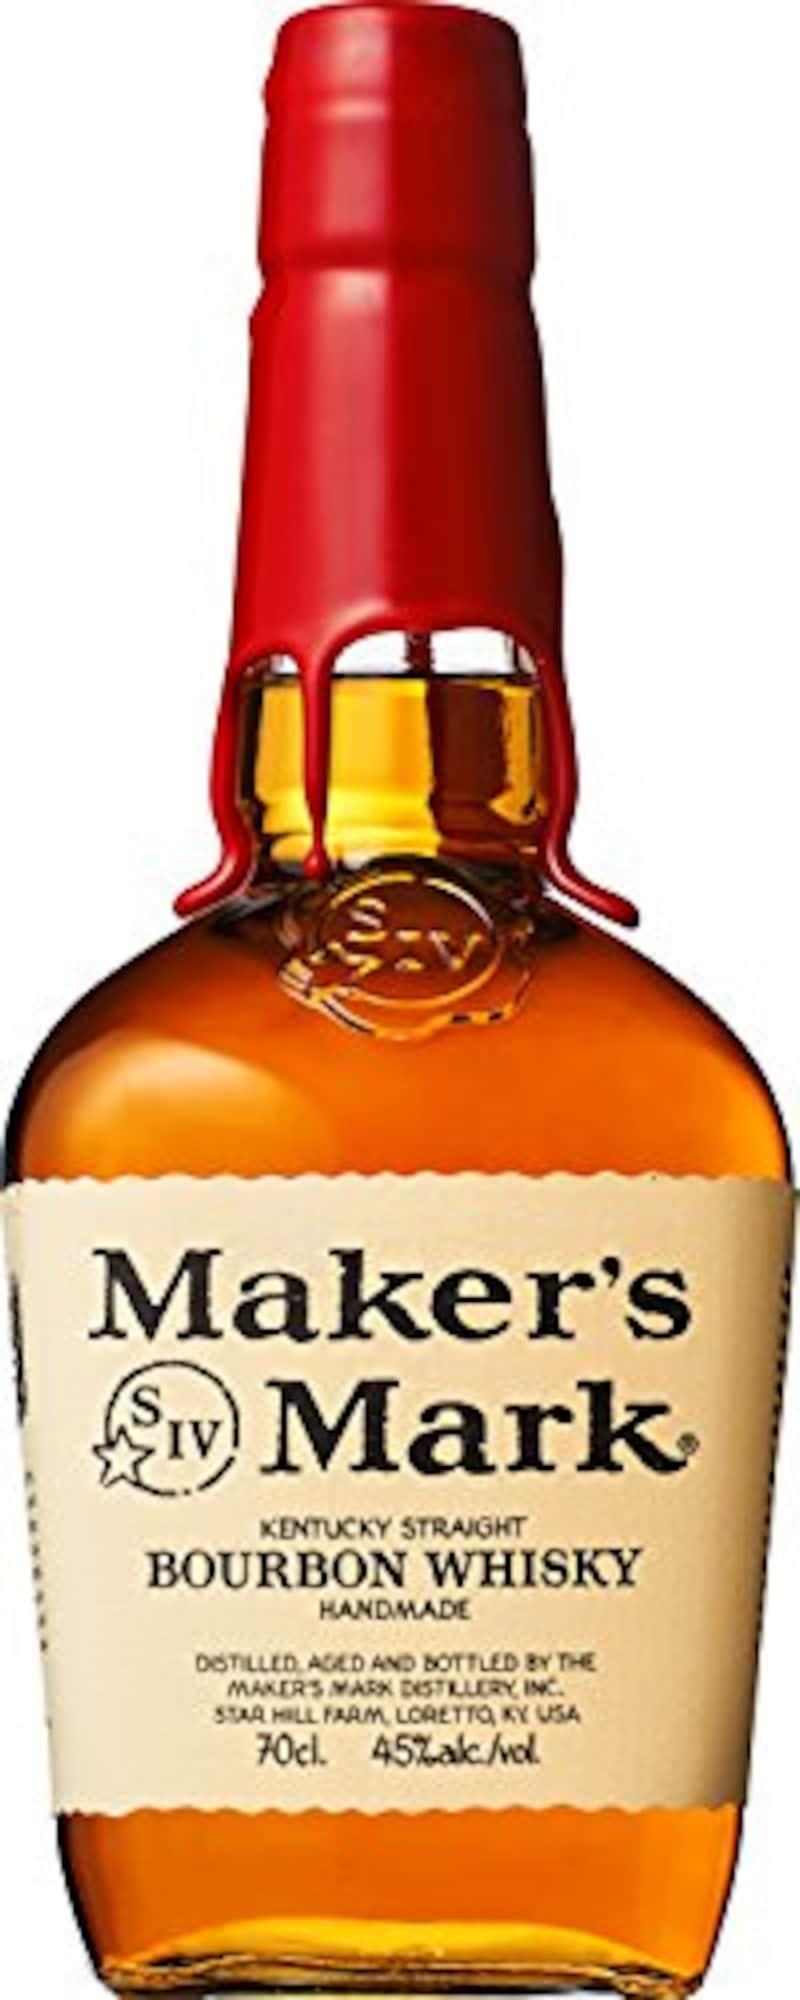 MAKER'S MARK(メーカーズマーク),バーボンウイスキー,-